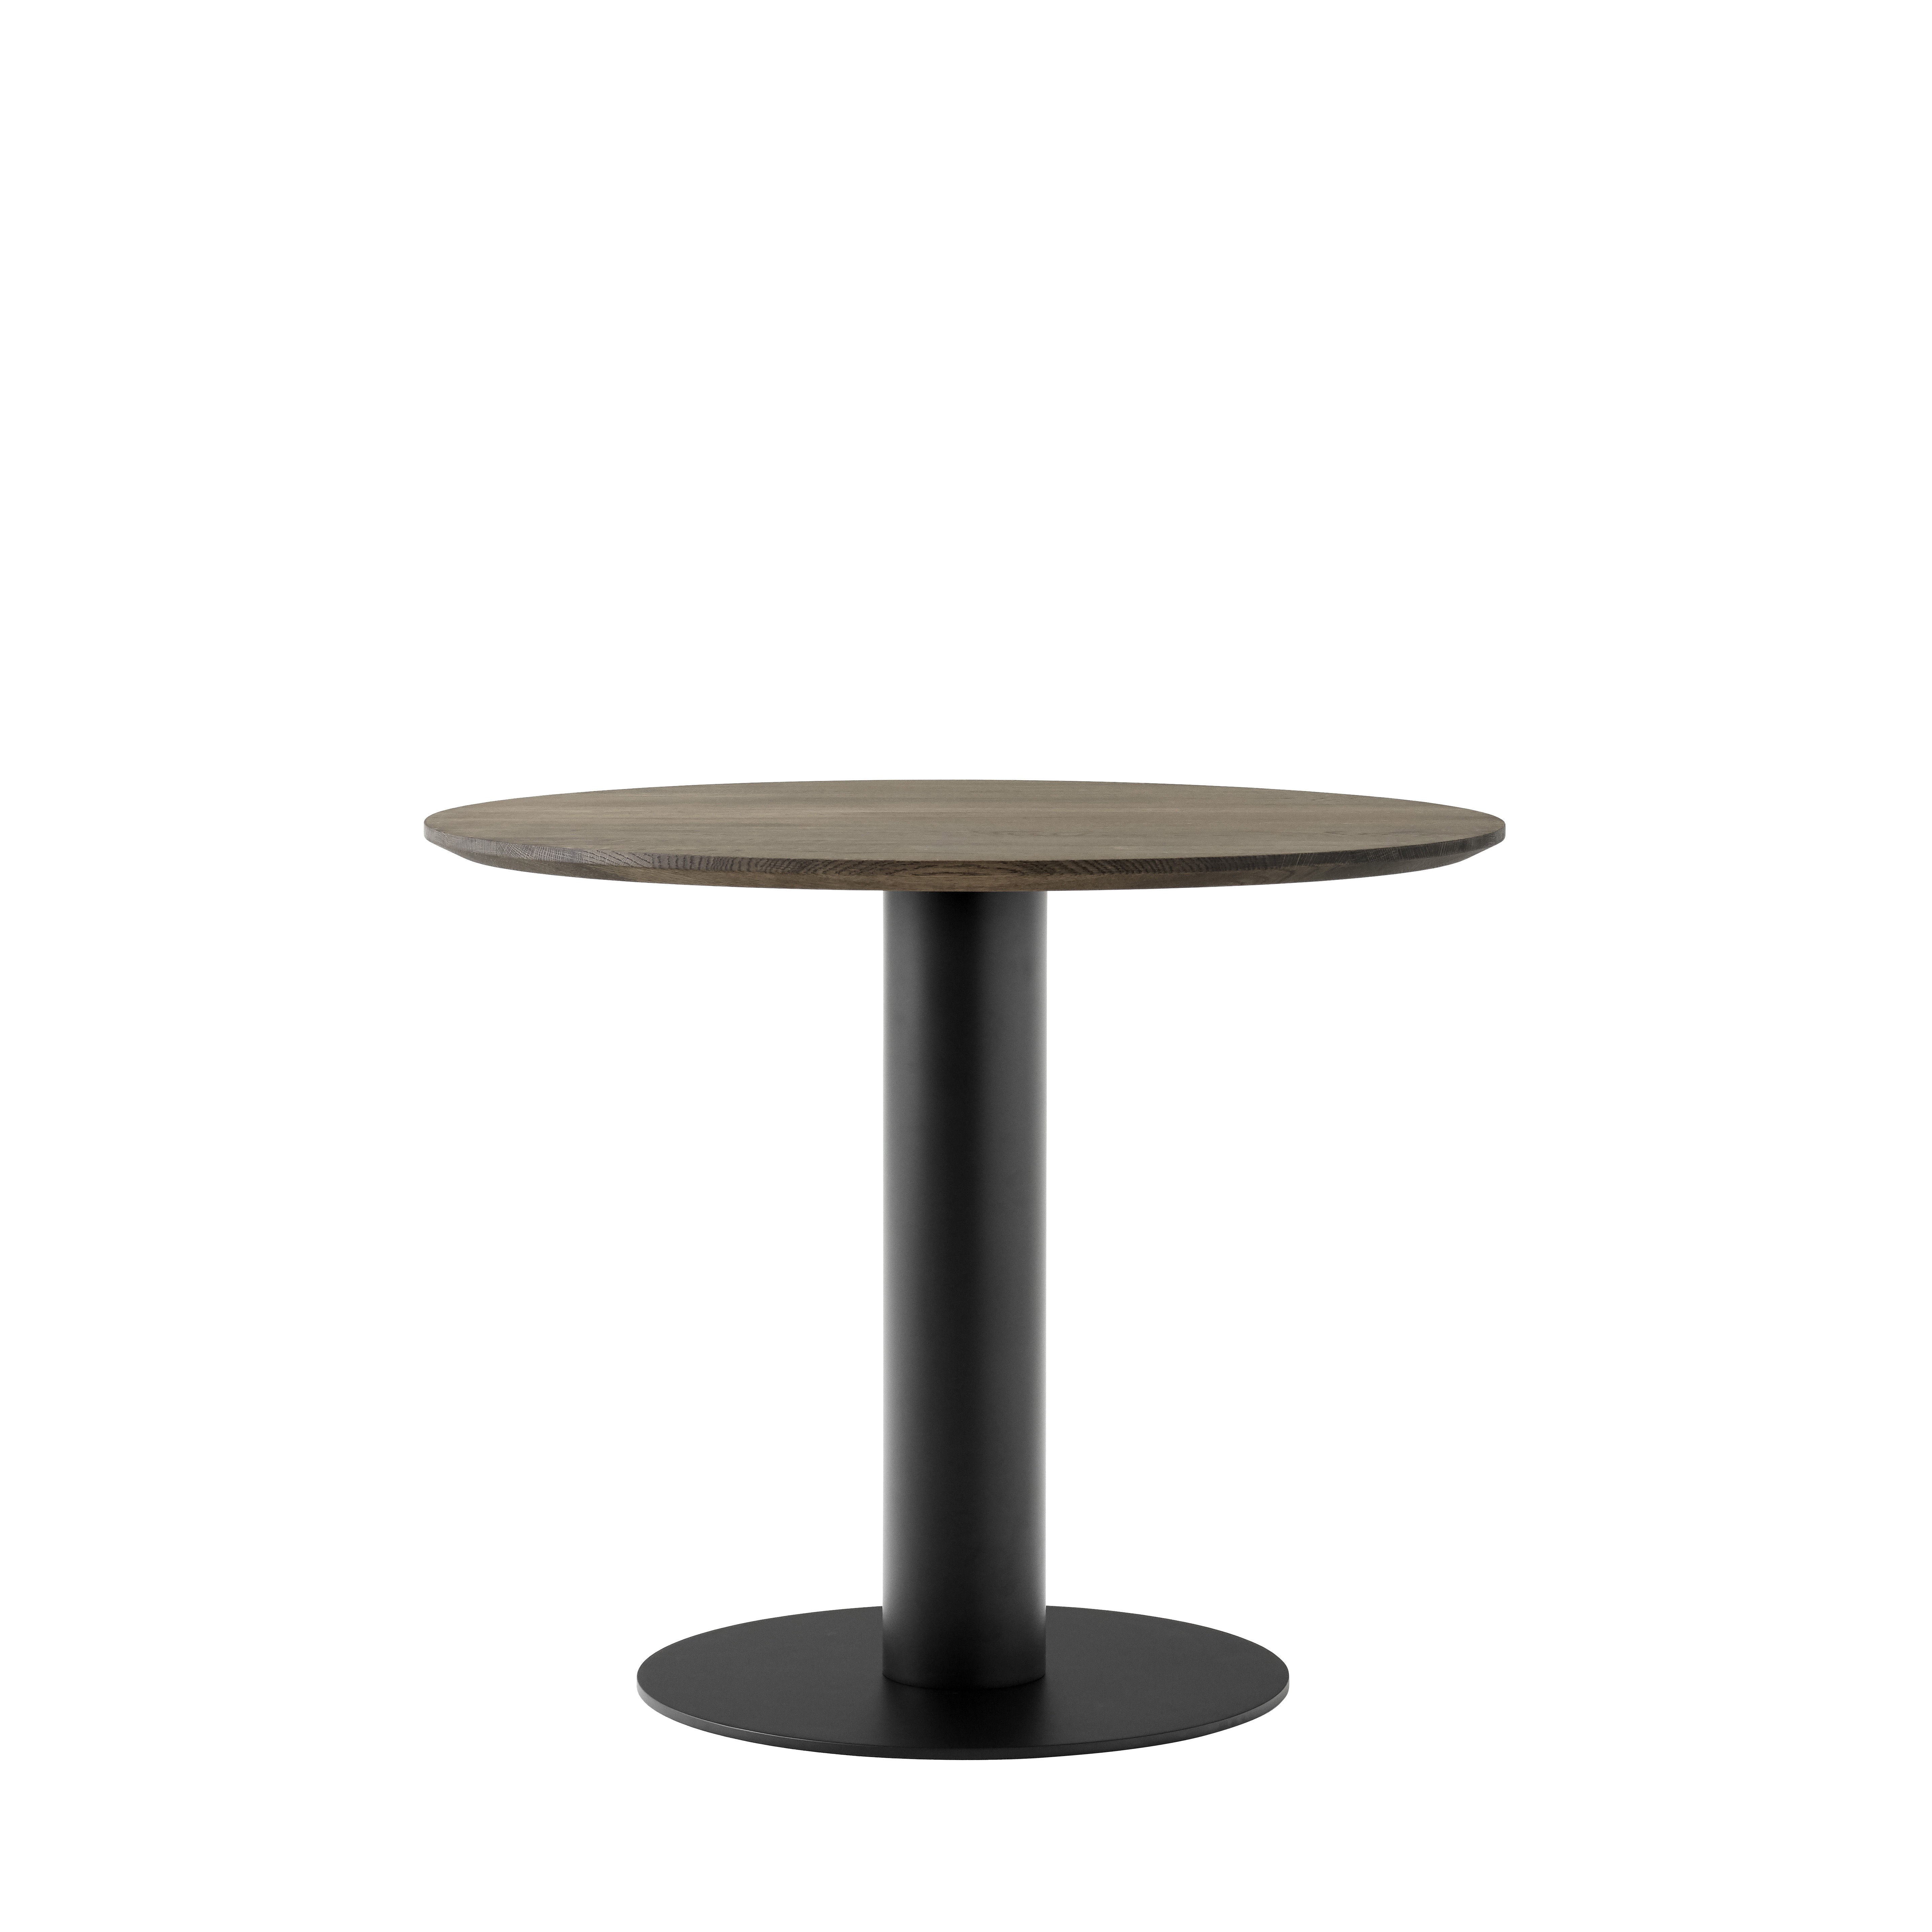 Mobilier - Tables - Table ronde In Between SK11 / Pied central - Ø 90 - Chêne - &tradition - Chêne fumé / Pied noir - Chêne massif fumé, Métal